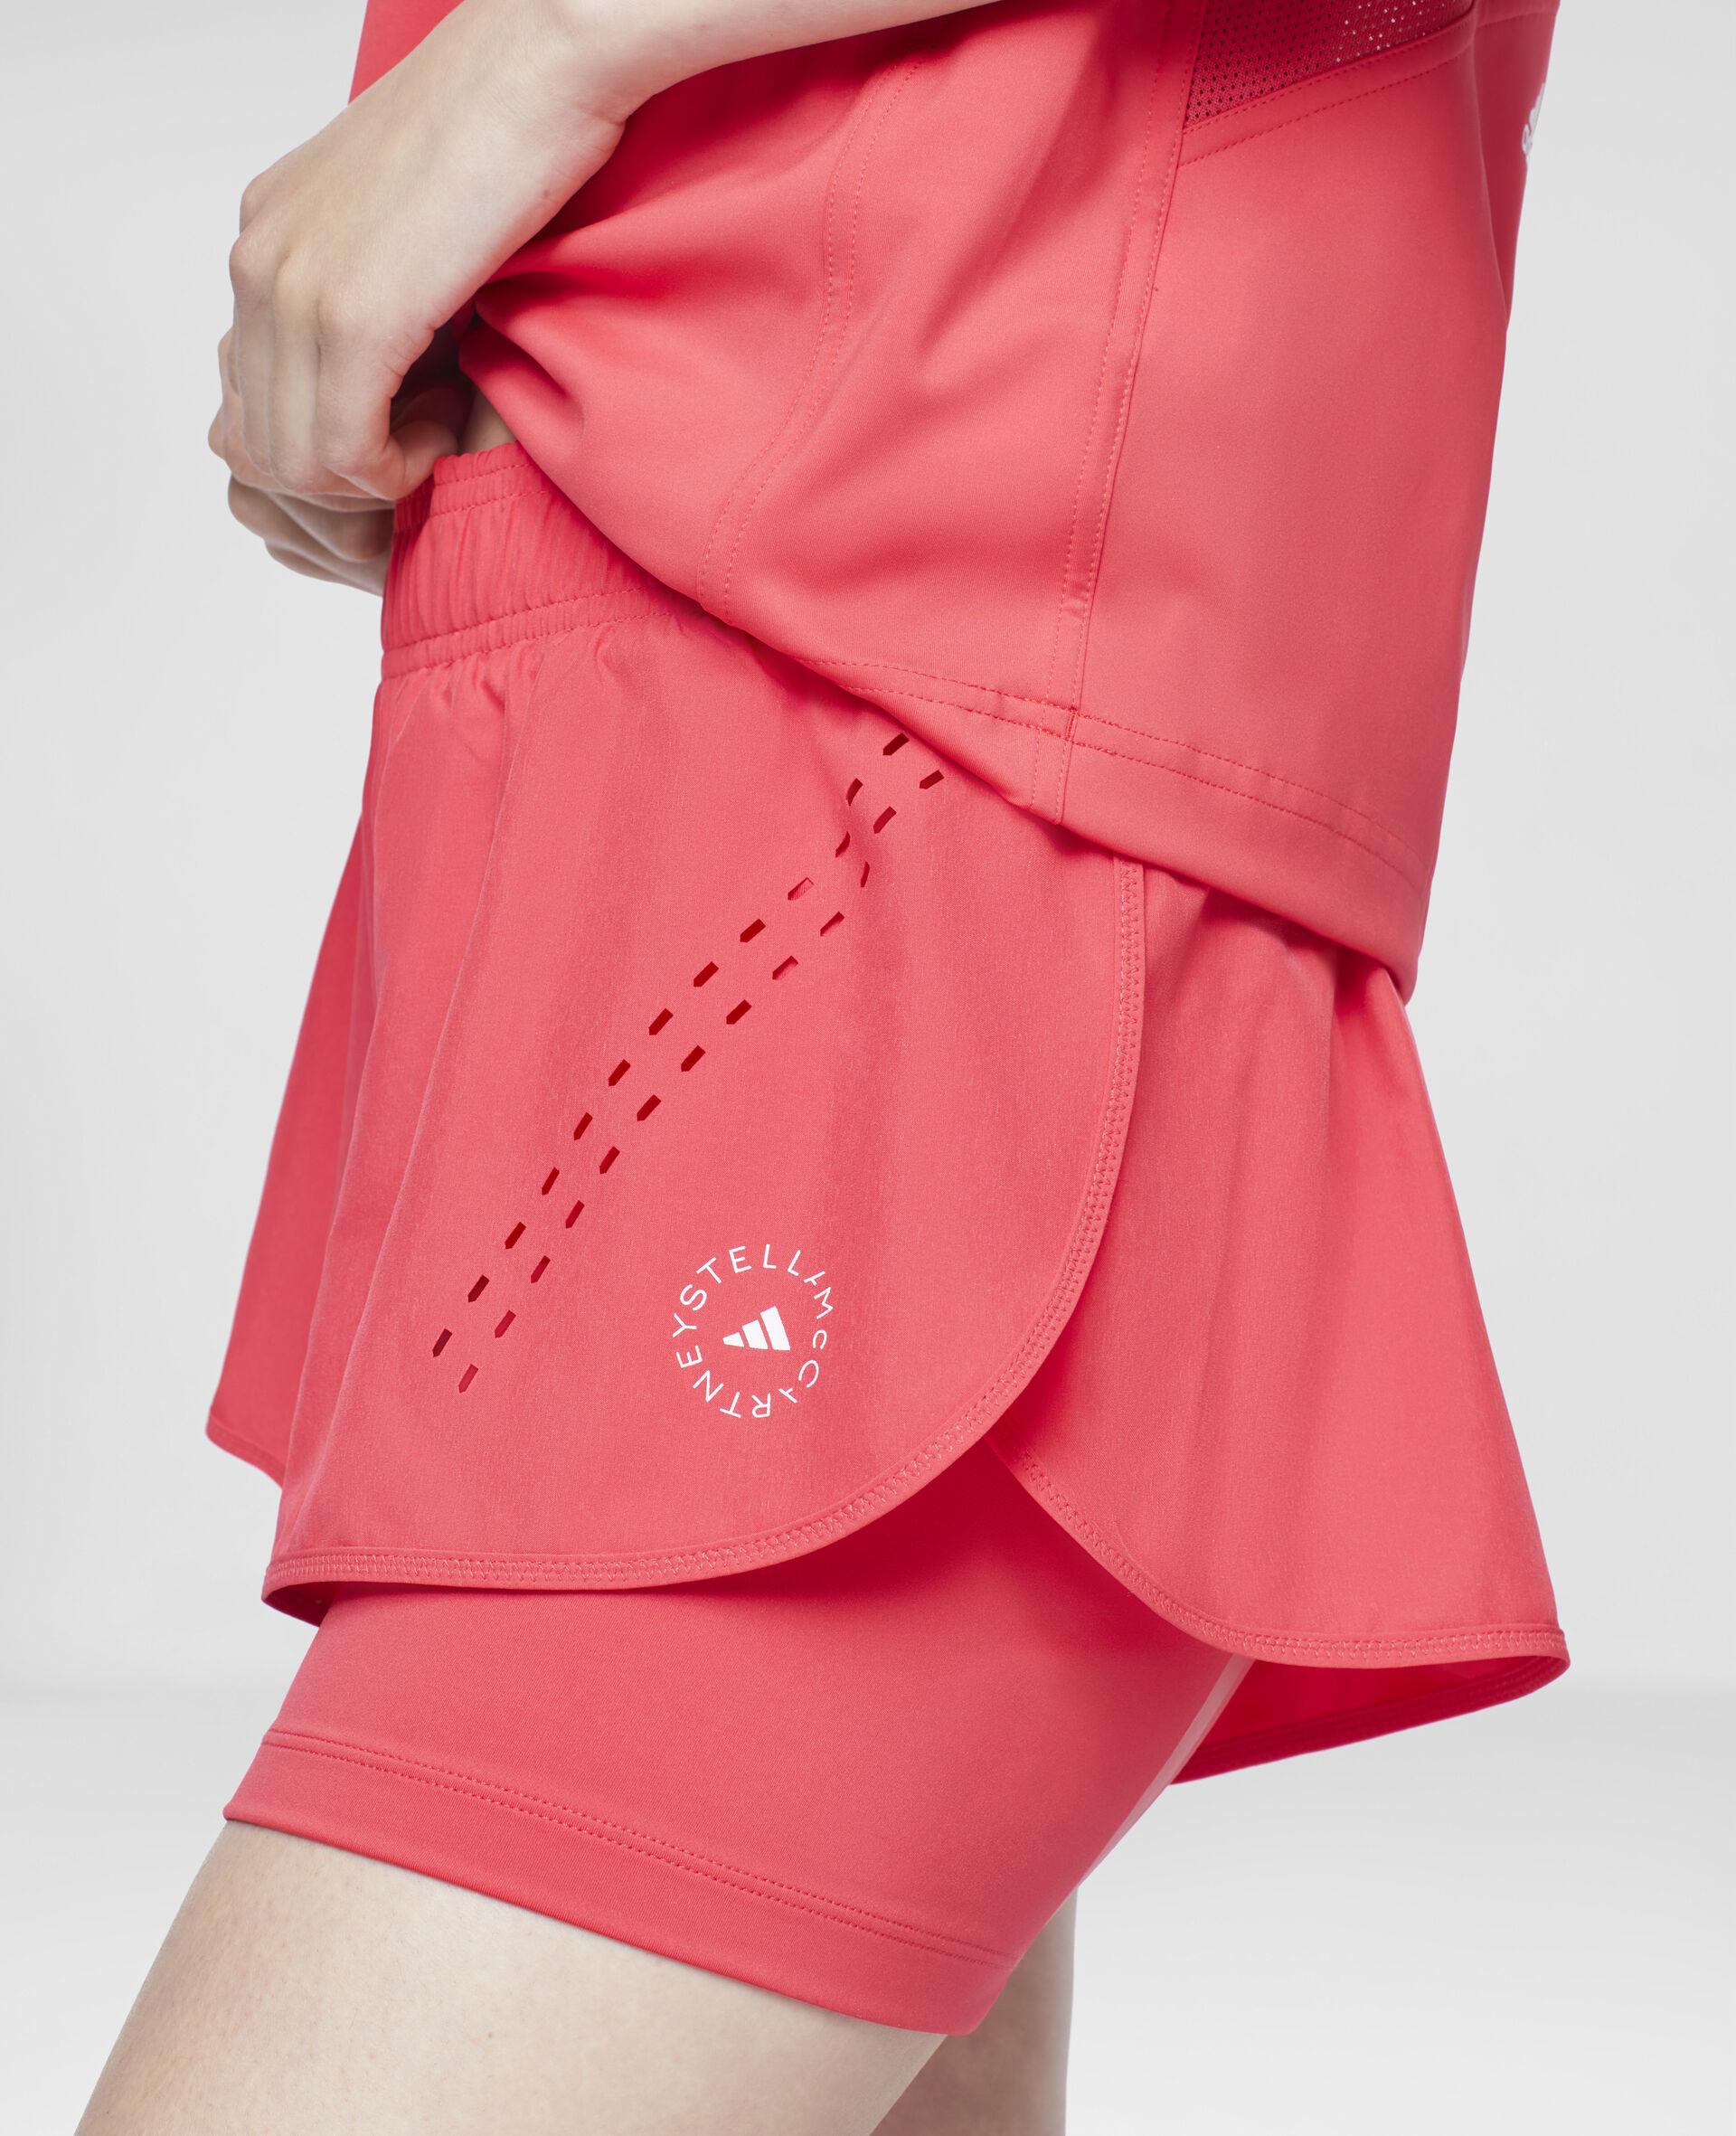 Rosa TruePurpose Trainings-Shorts-Rose-large image number 3